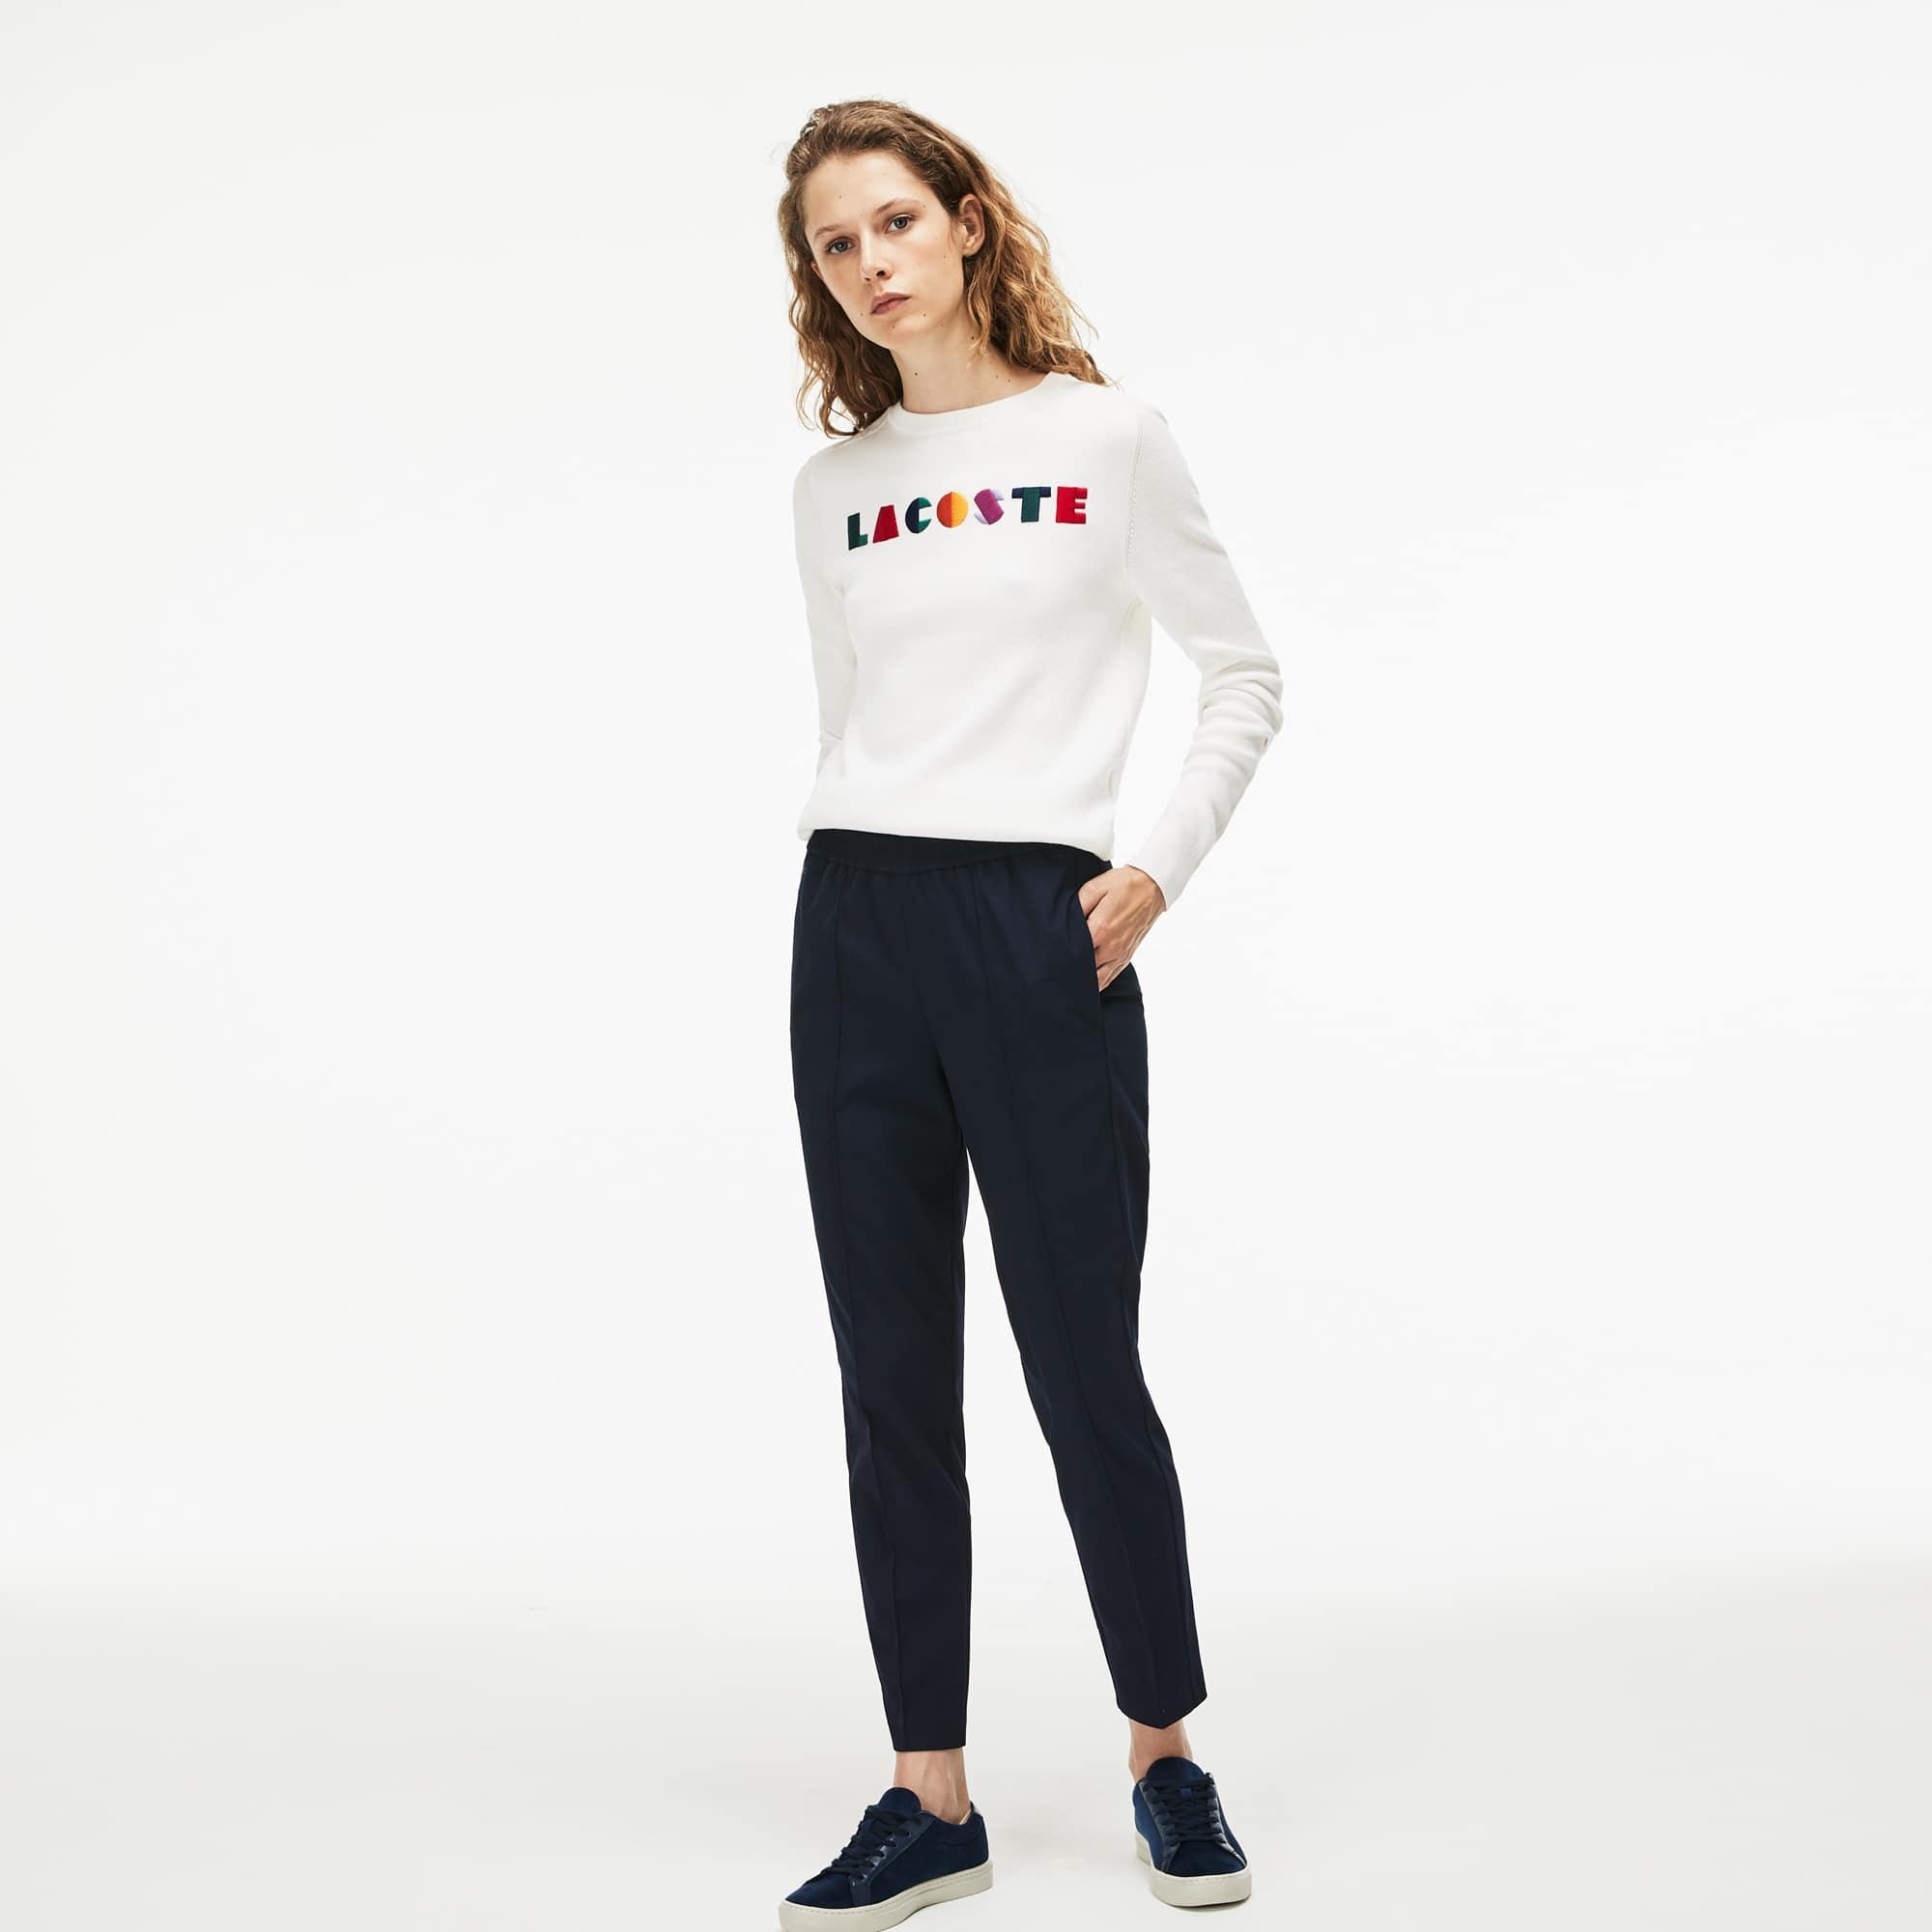 Women's City Jog Regular Fit Striped Stretch Urban Jogging Pants